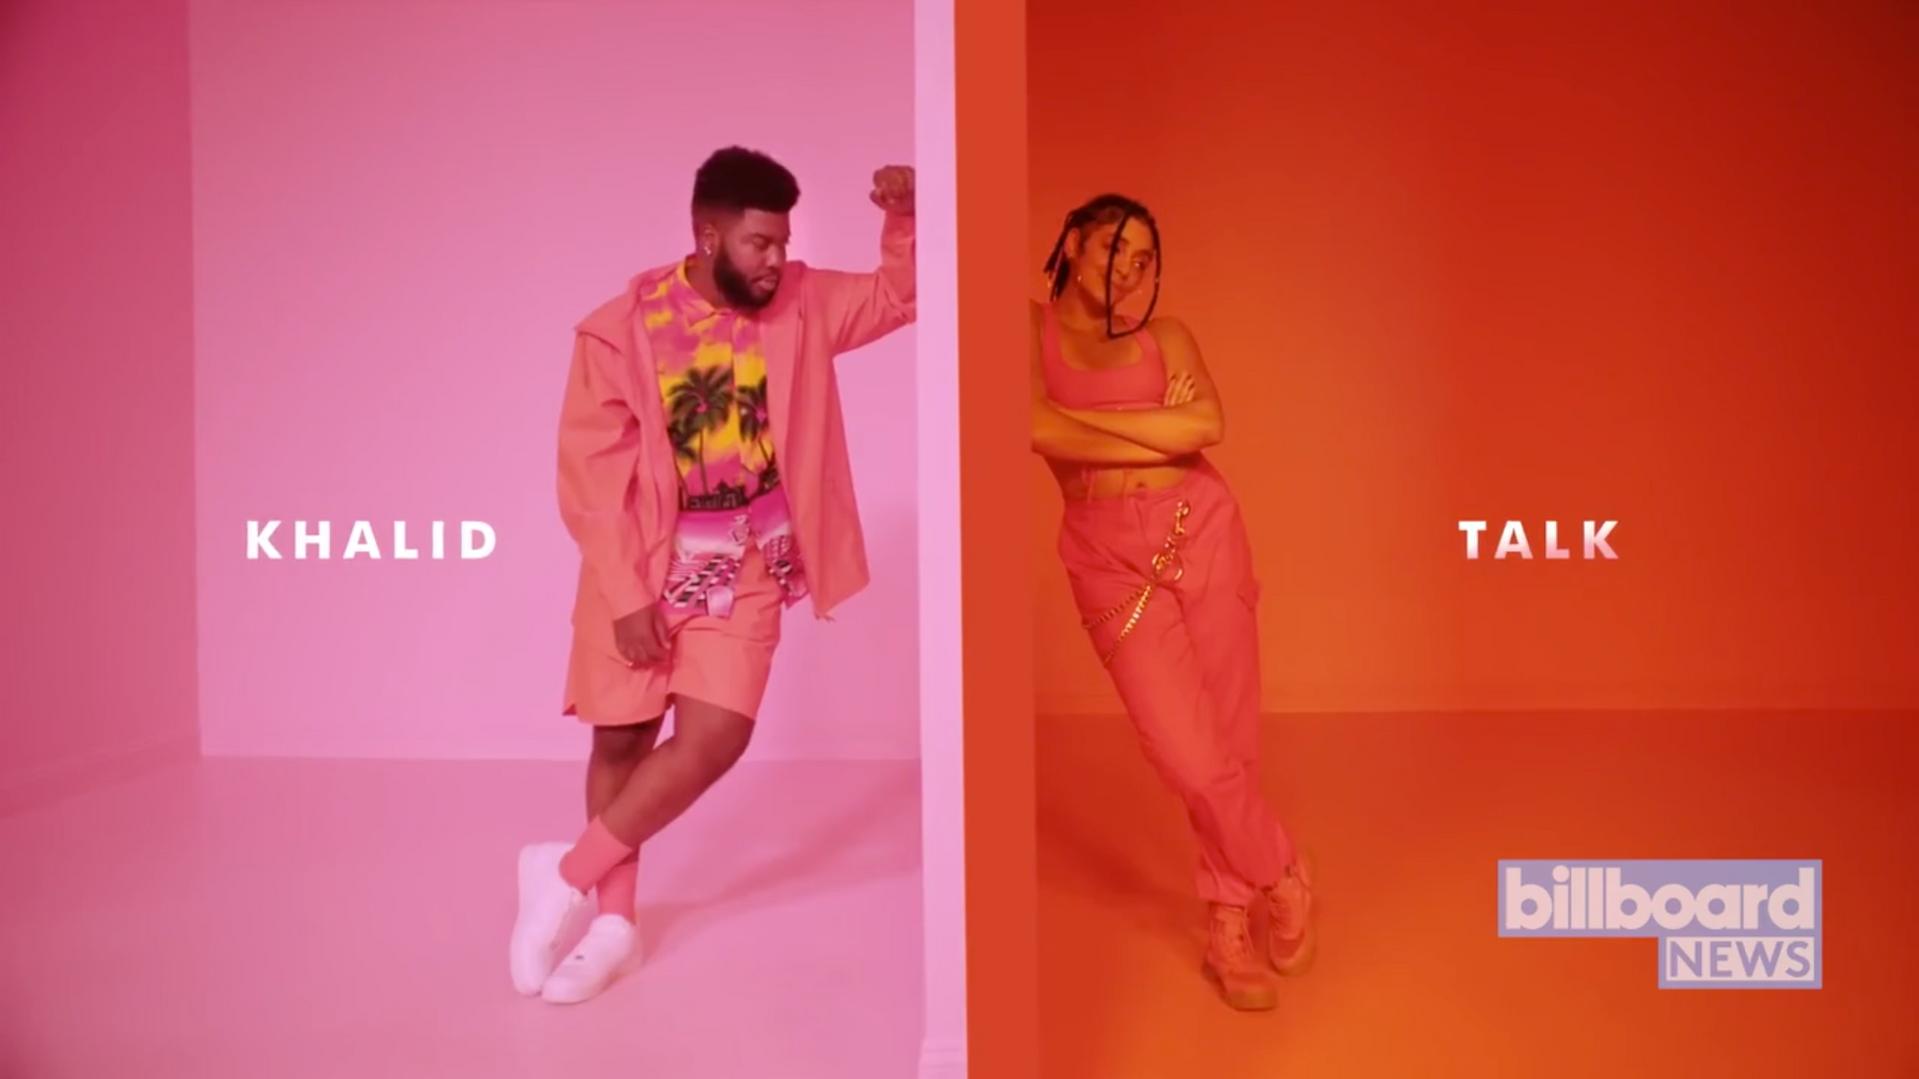 Khalid Earns First No. 1 on R&B Hip-Hop Airplay Chart With 'Talk' Billboard News